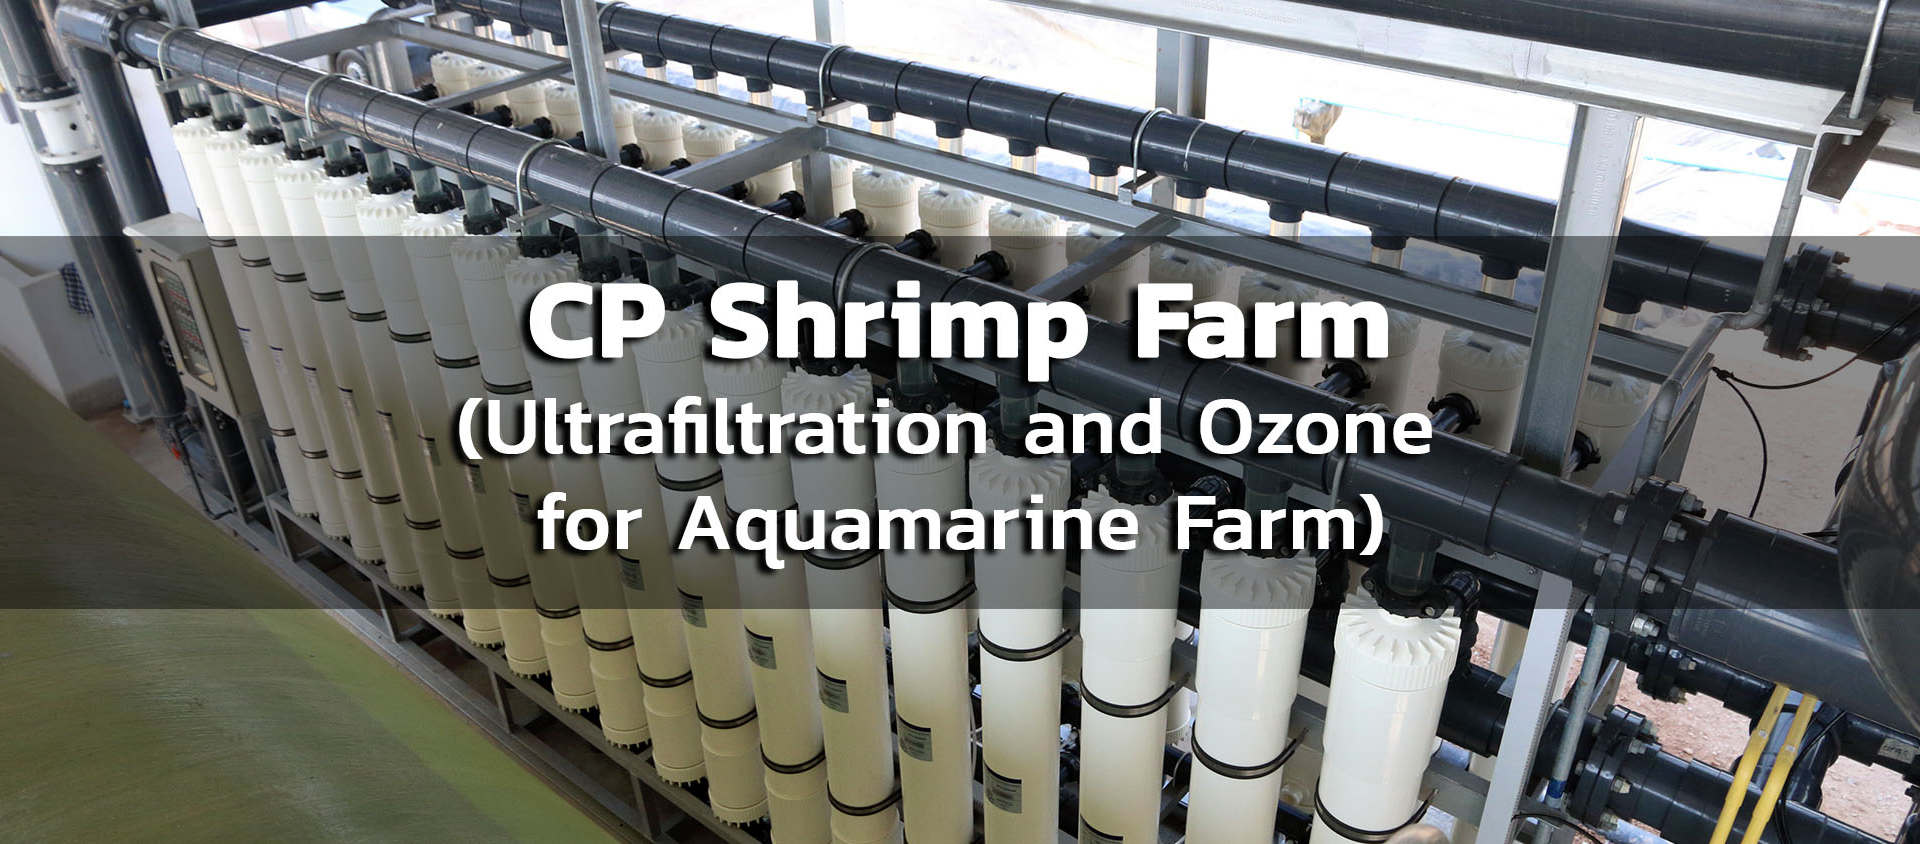 CP Shrimp Farm